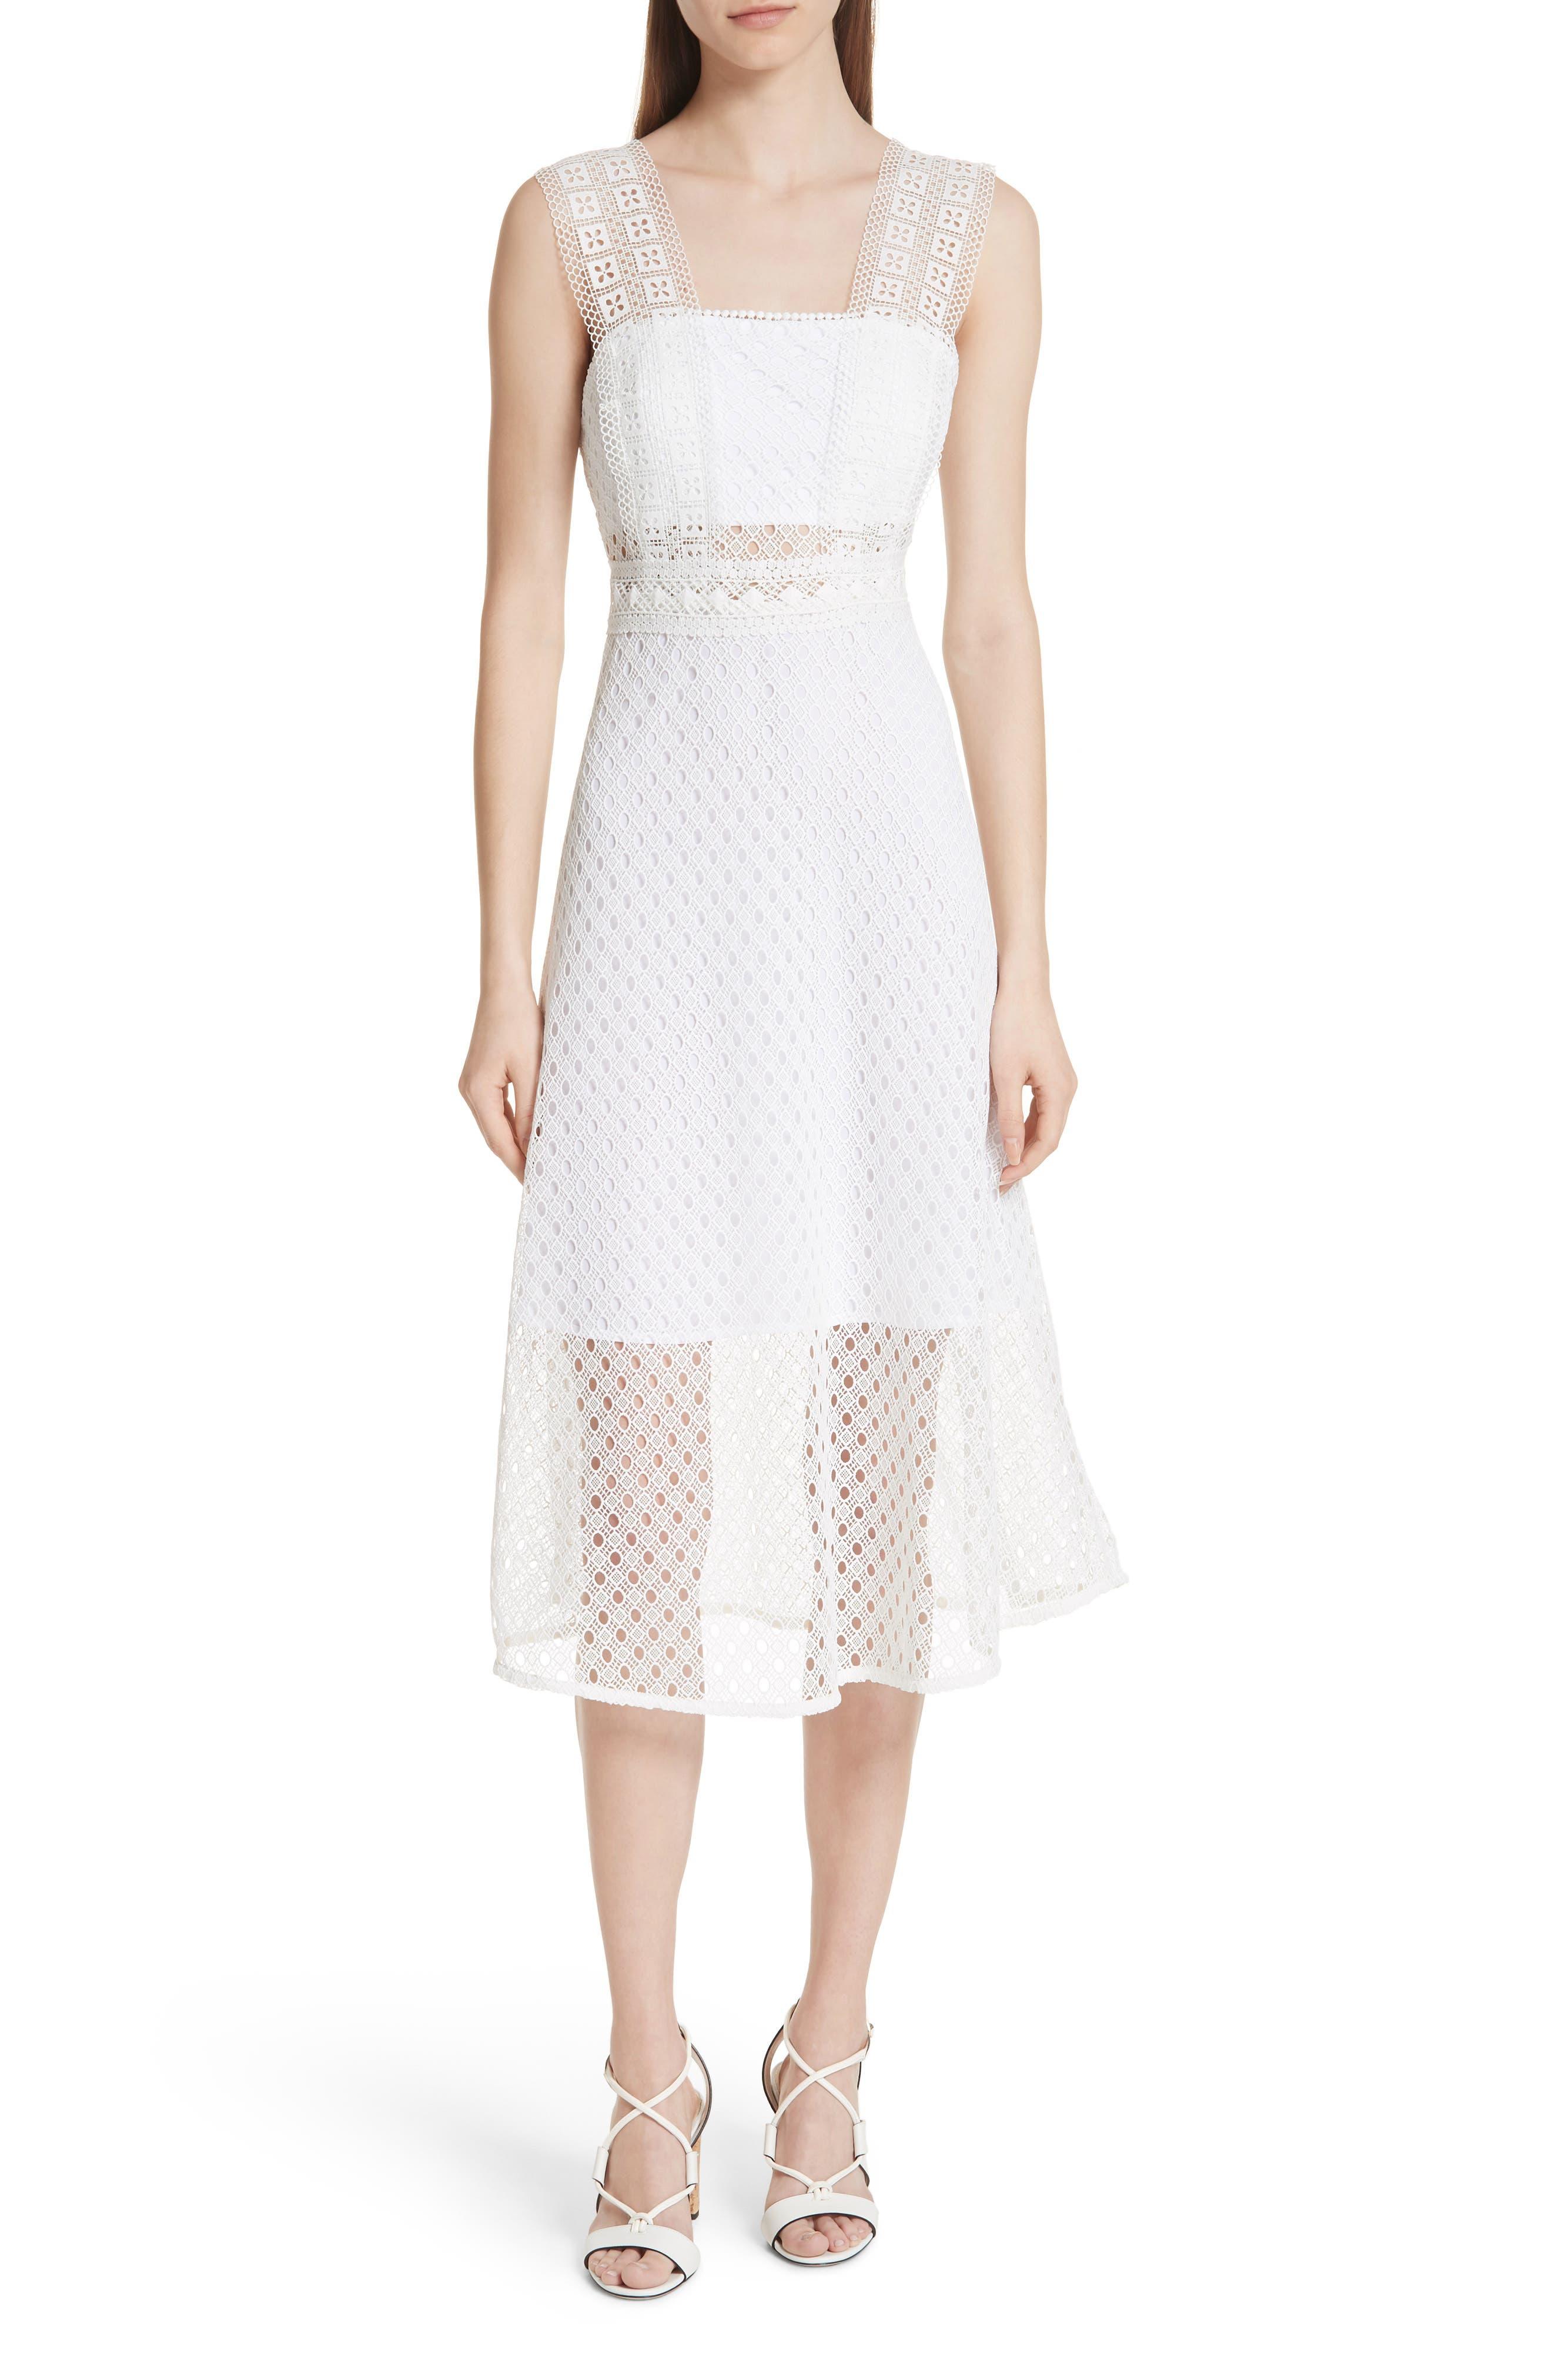 Blanc Lace Square Neck Dress,                             Main thumbnail 1, color,                             100